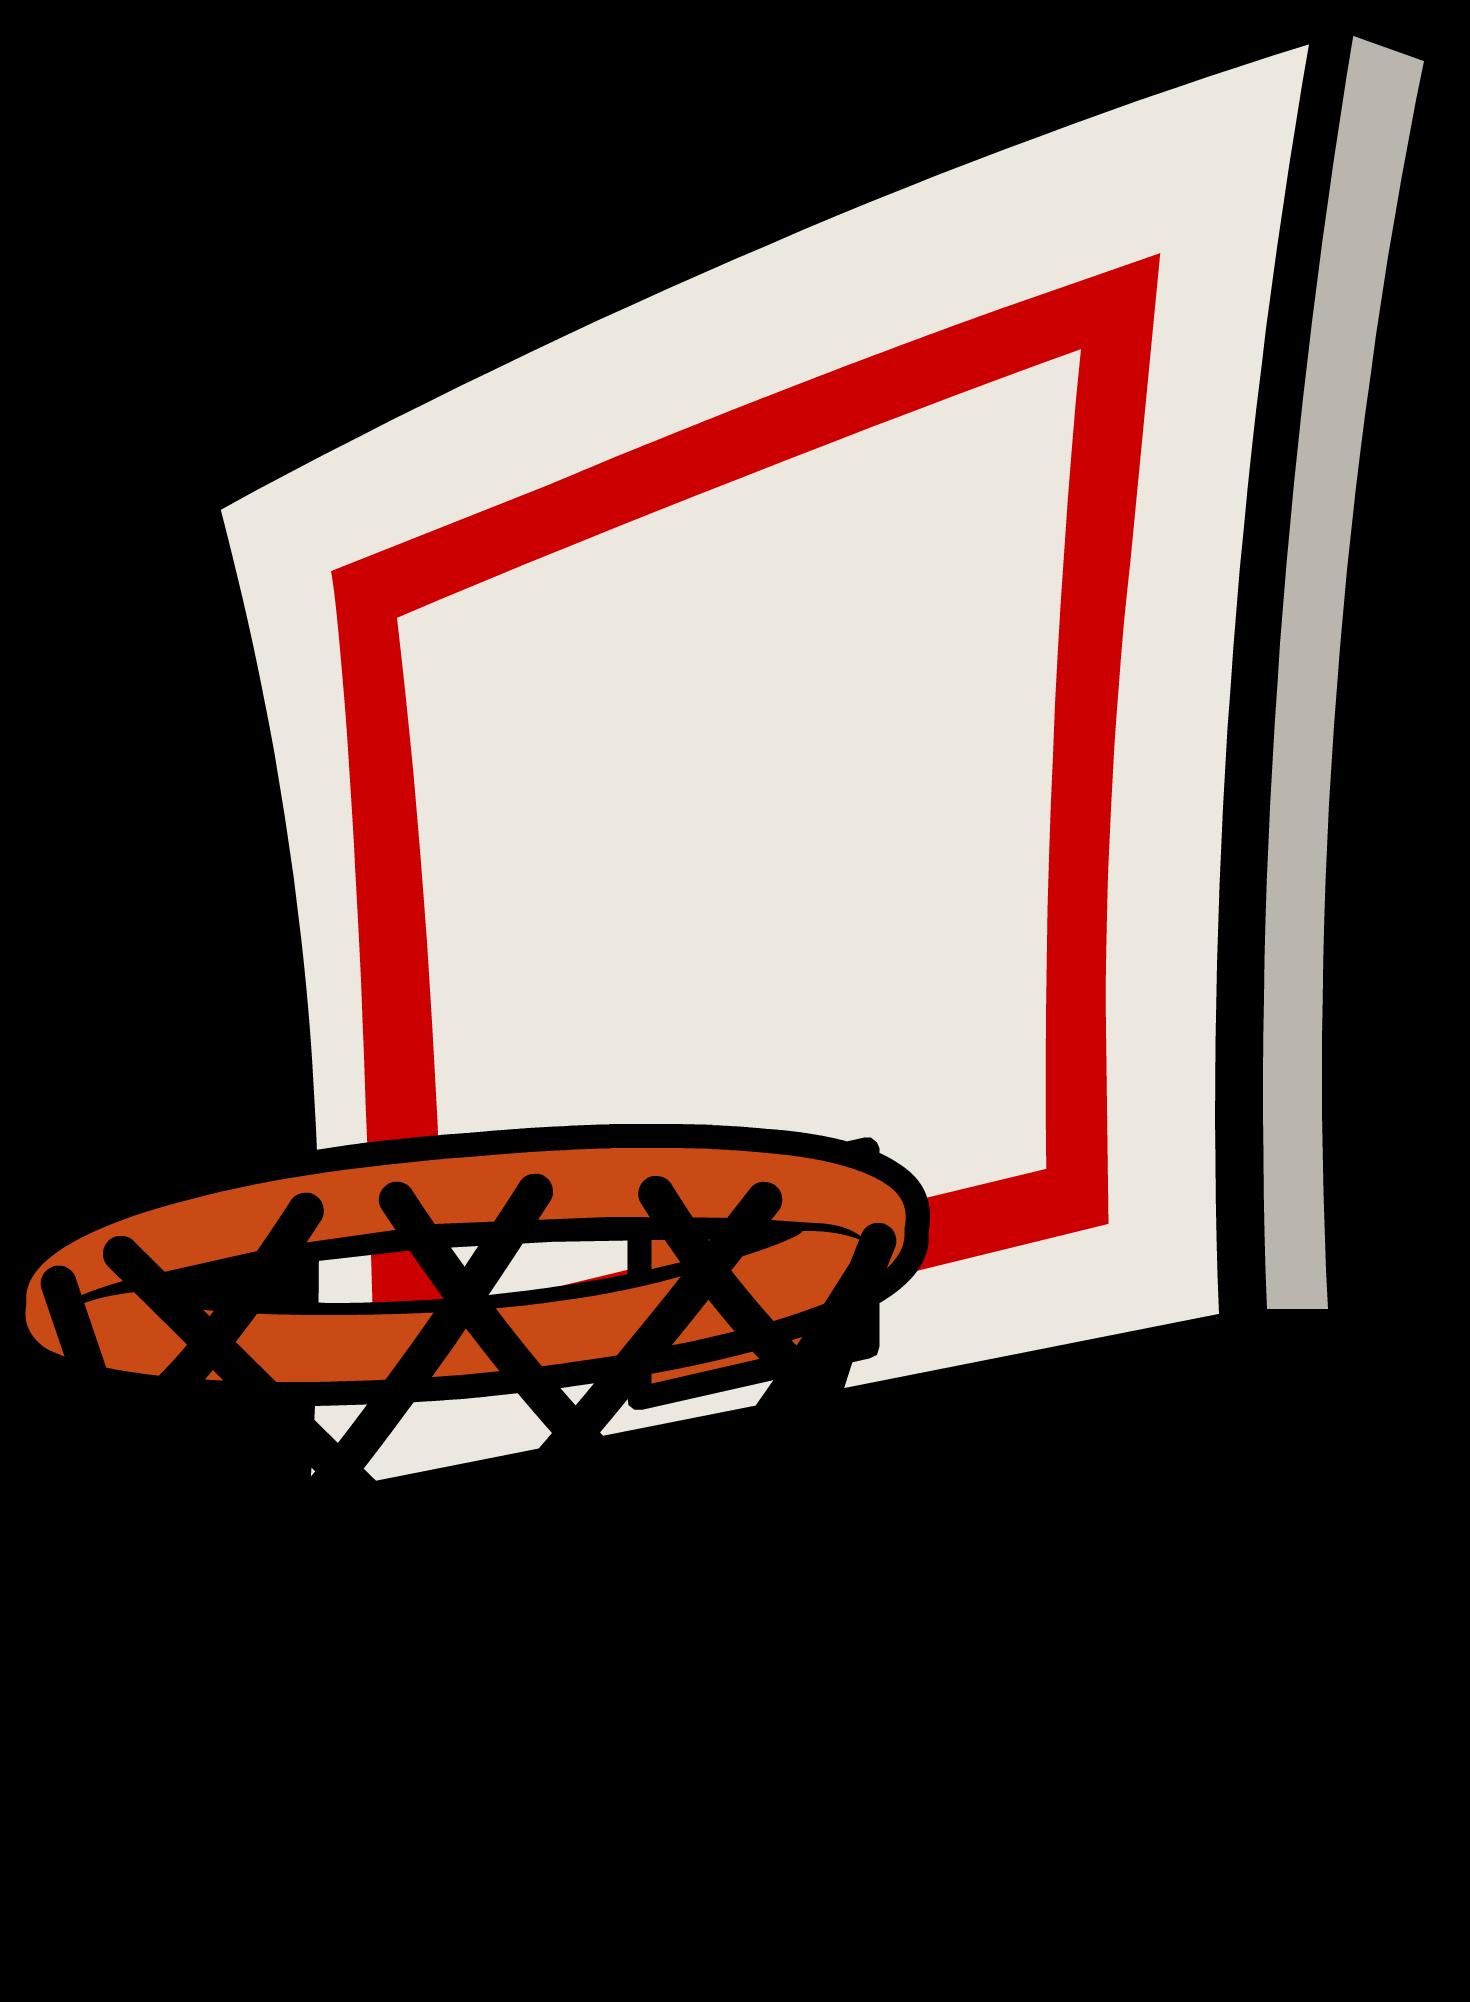 Basketball Goal Clipart Transparent.